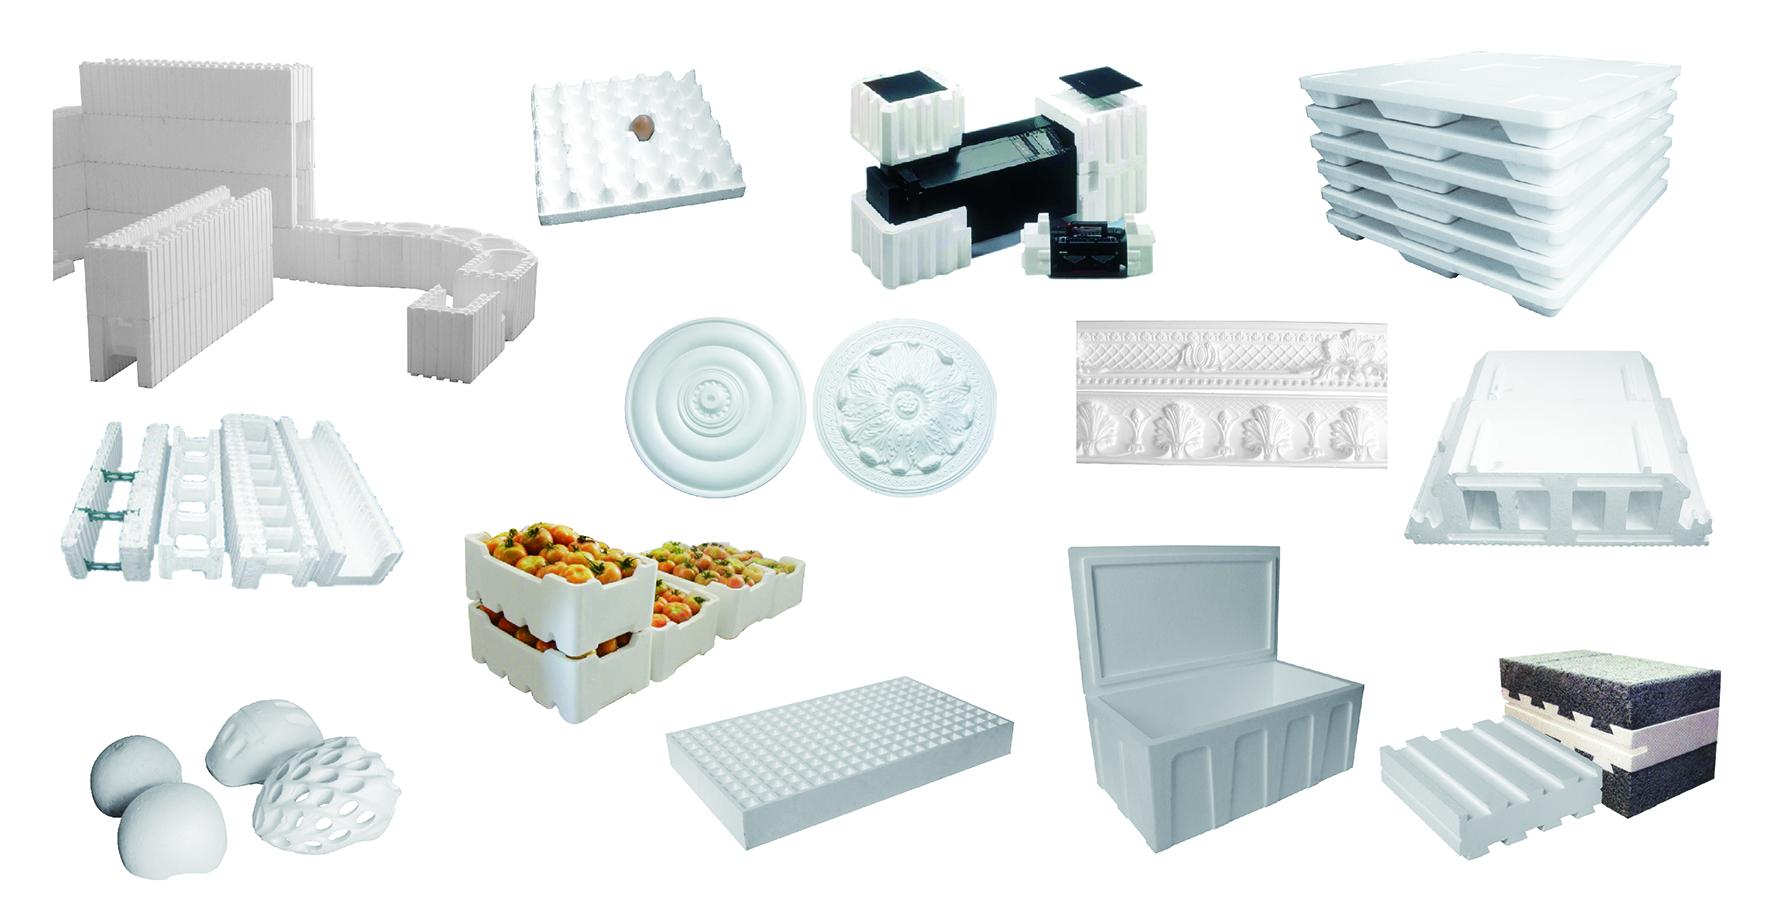 Fangyuan eps schuim machine fabricage koelbox verpakking piepschuim